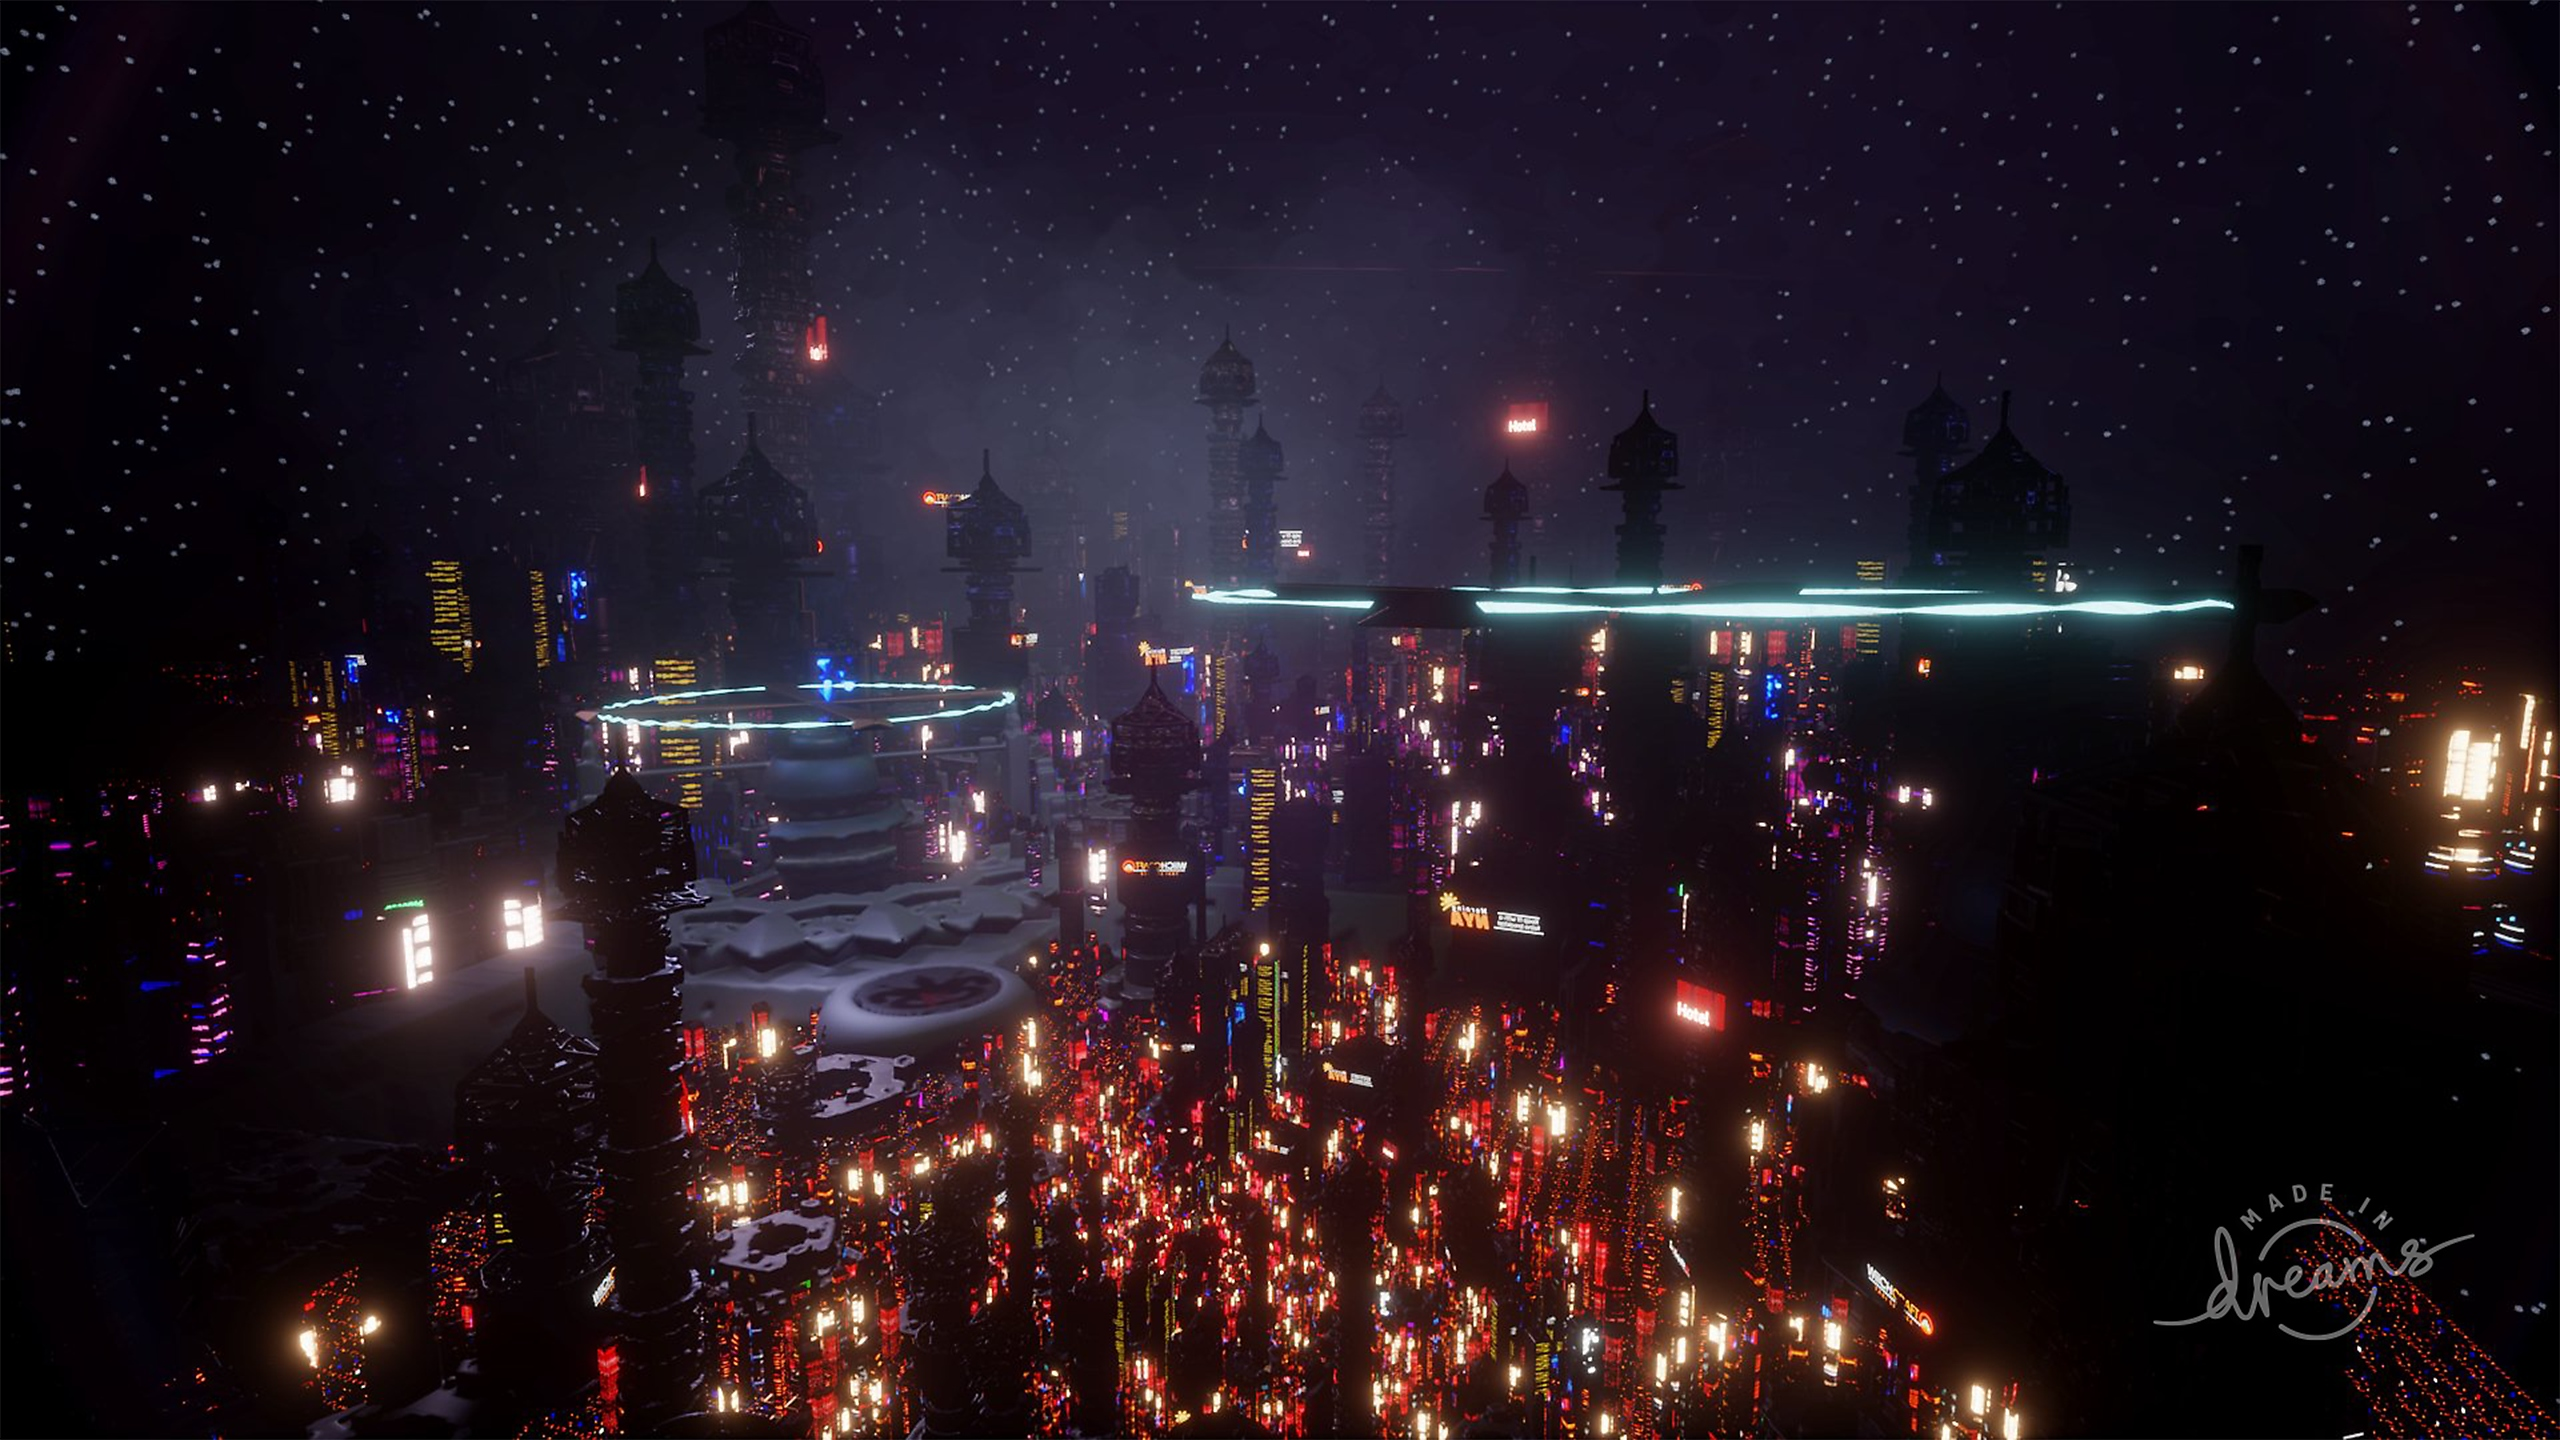 Dreams screenshot 15